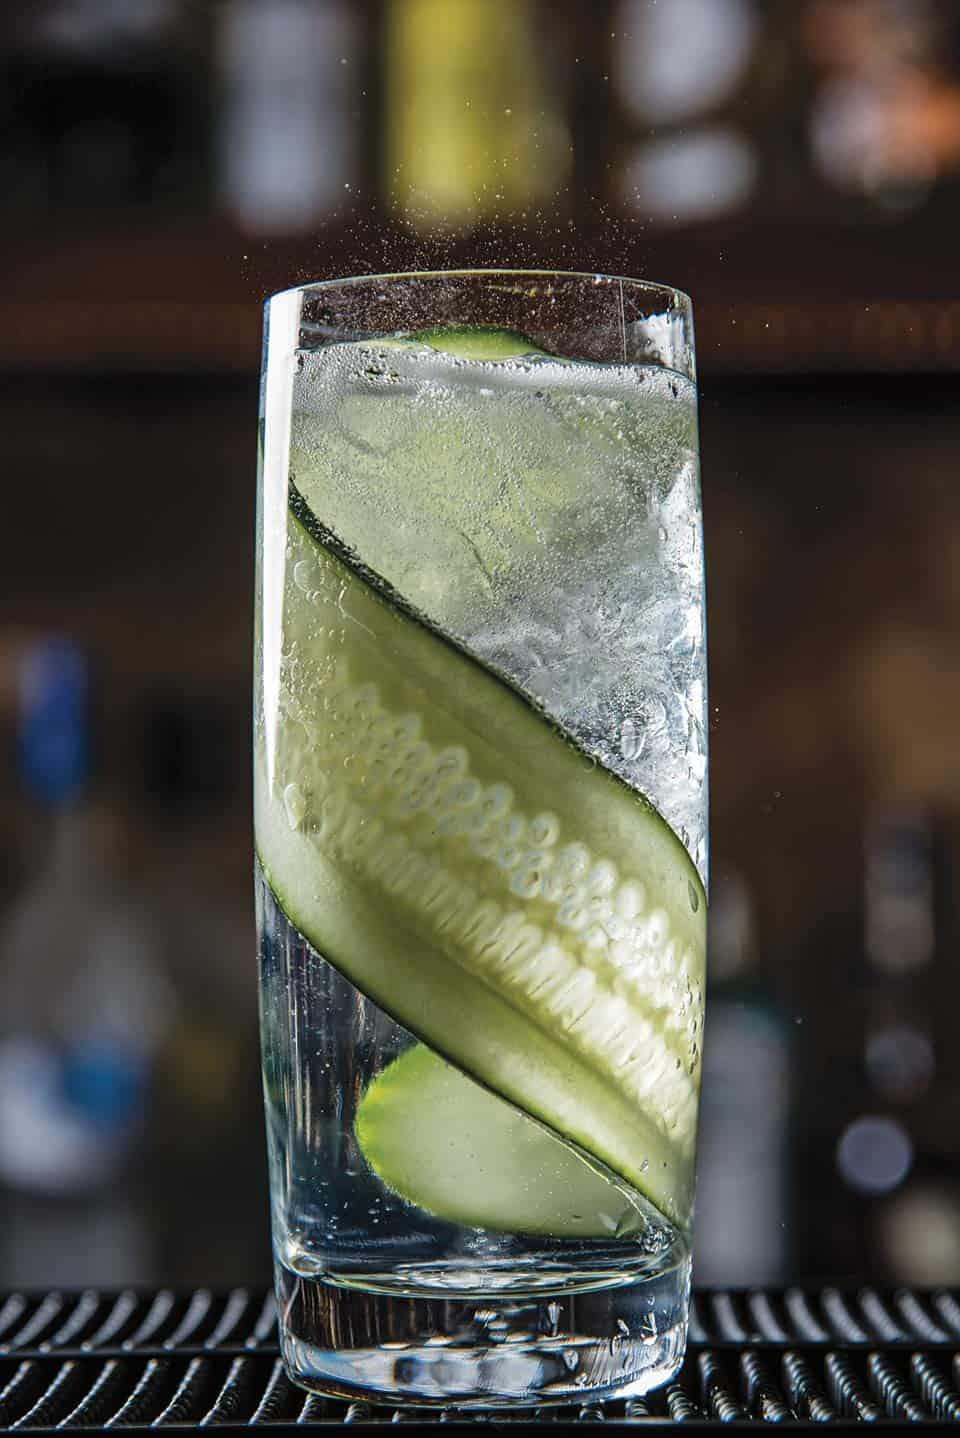 Coctel de tequila, Jacinto1930